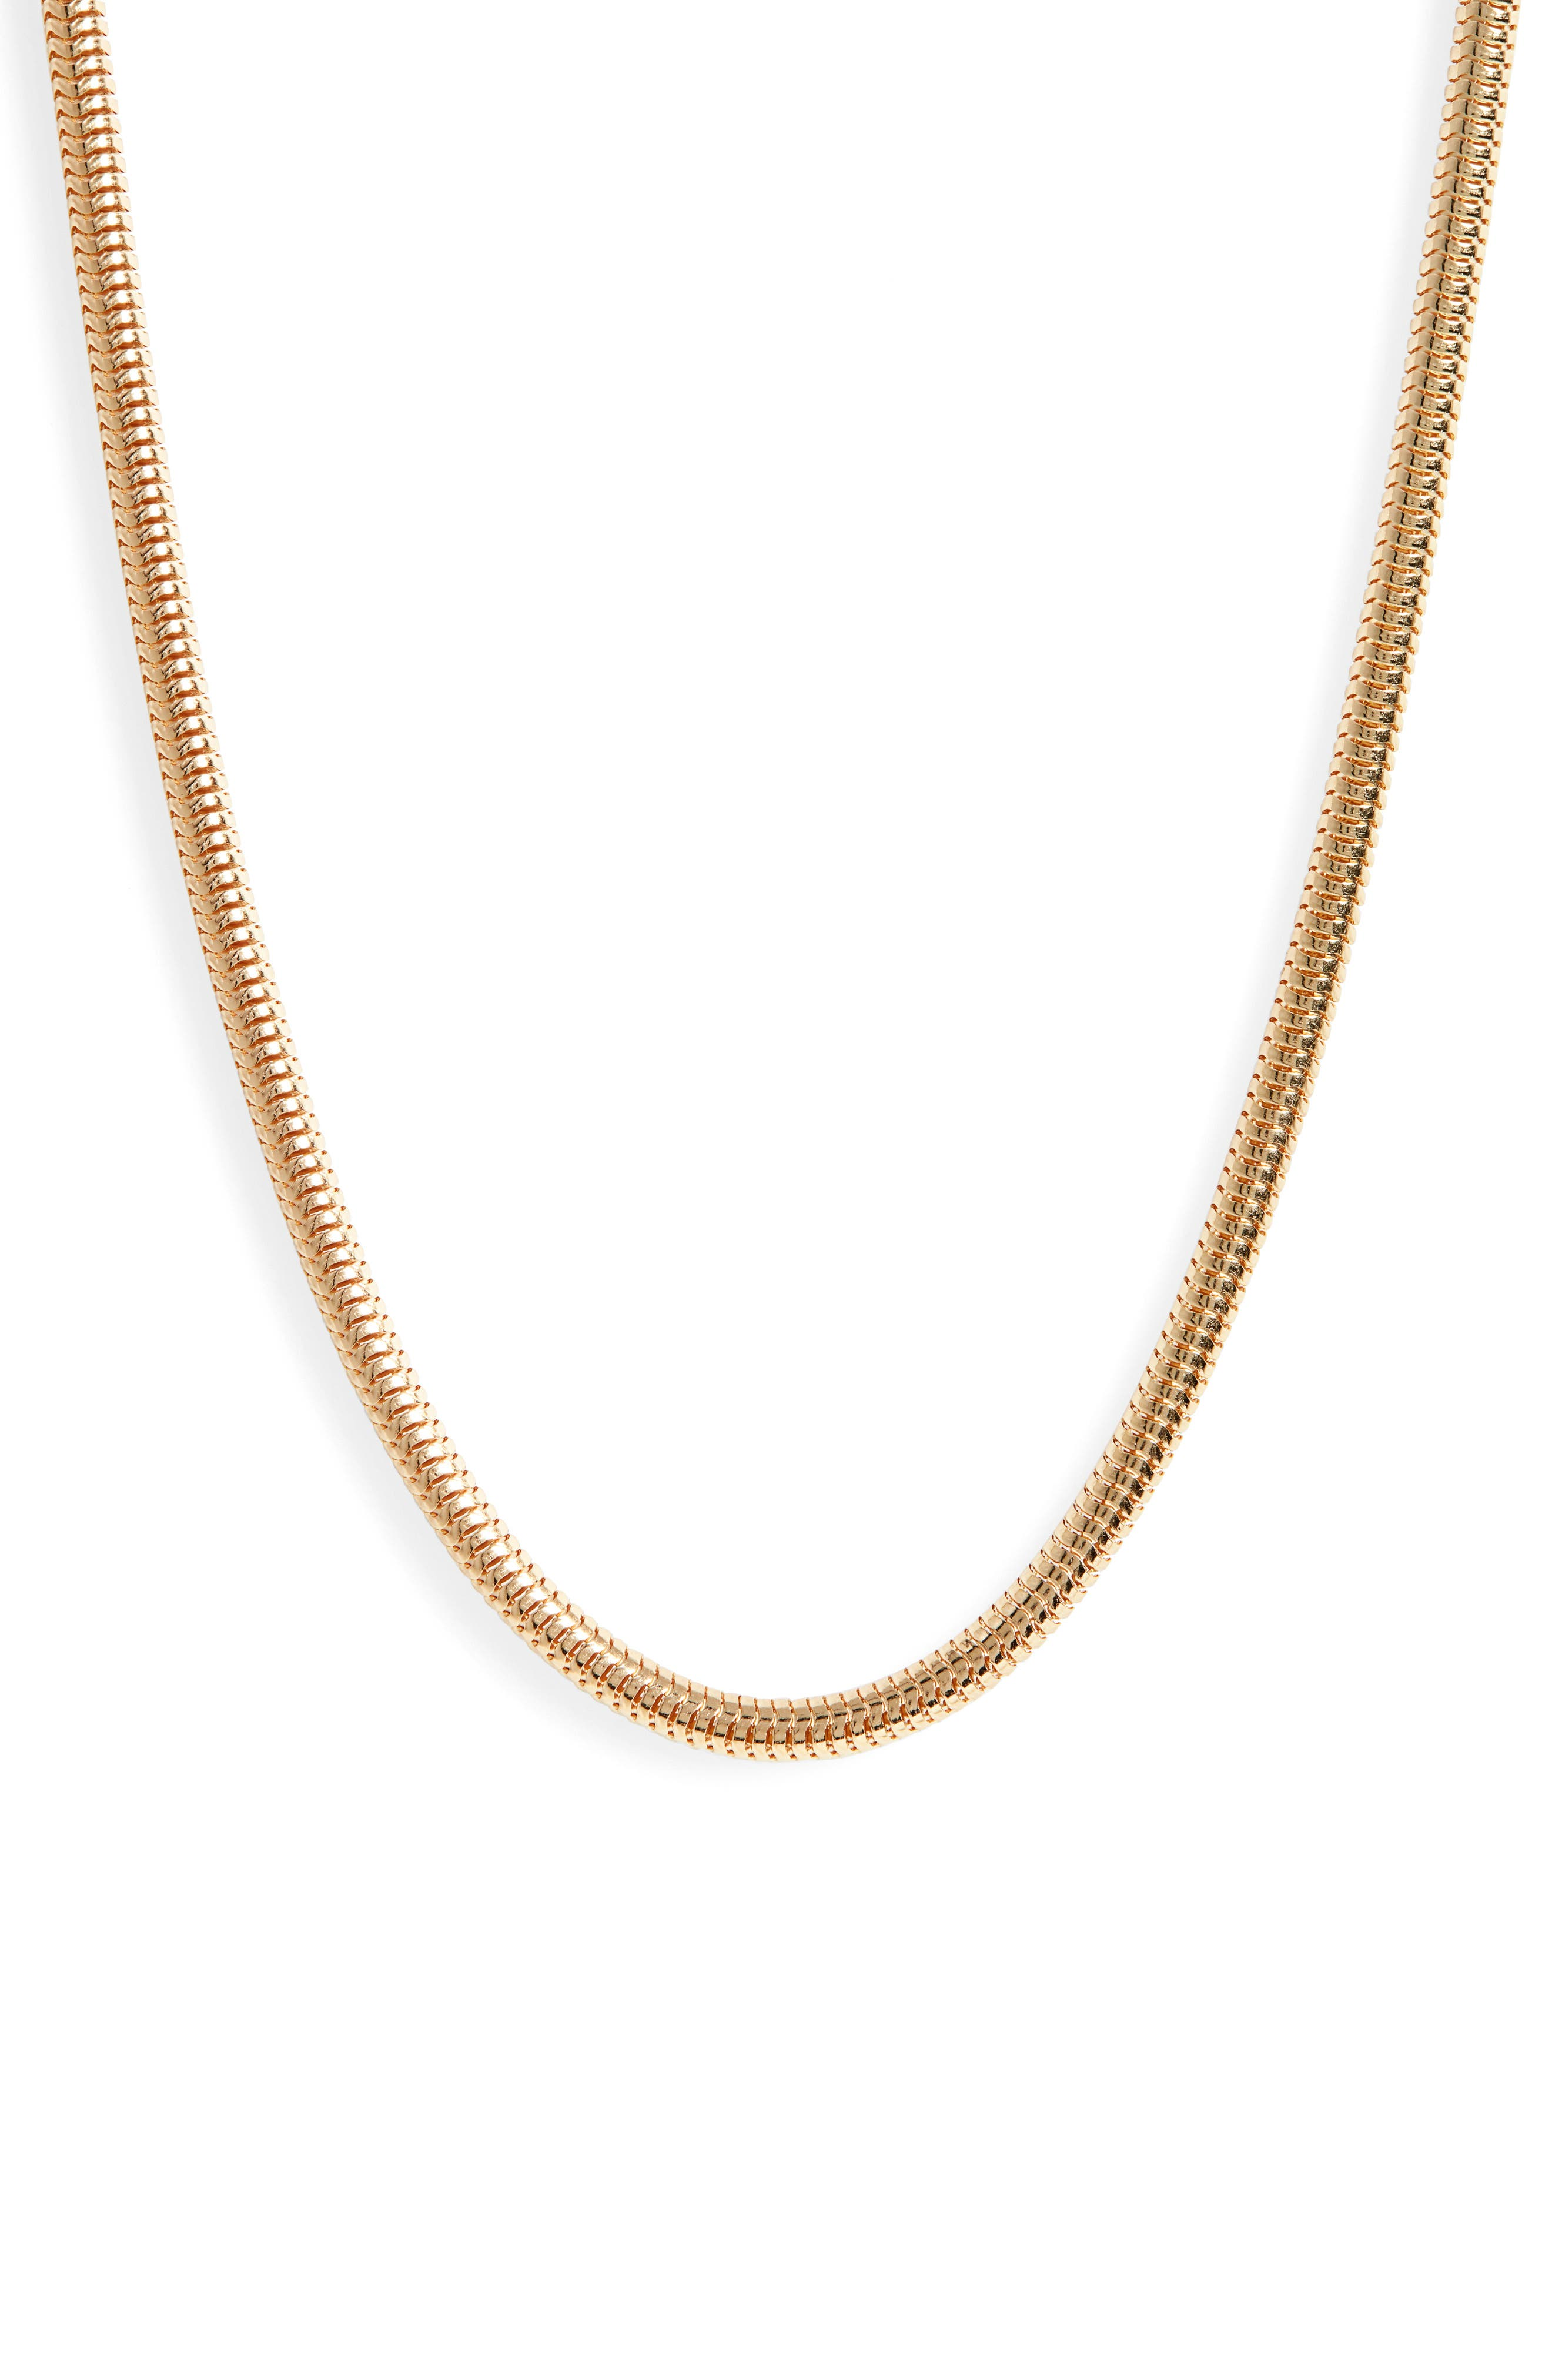 Zenith Gold Vermeil Snake Chain Necklace